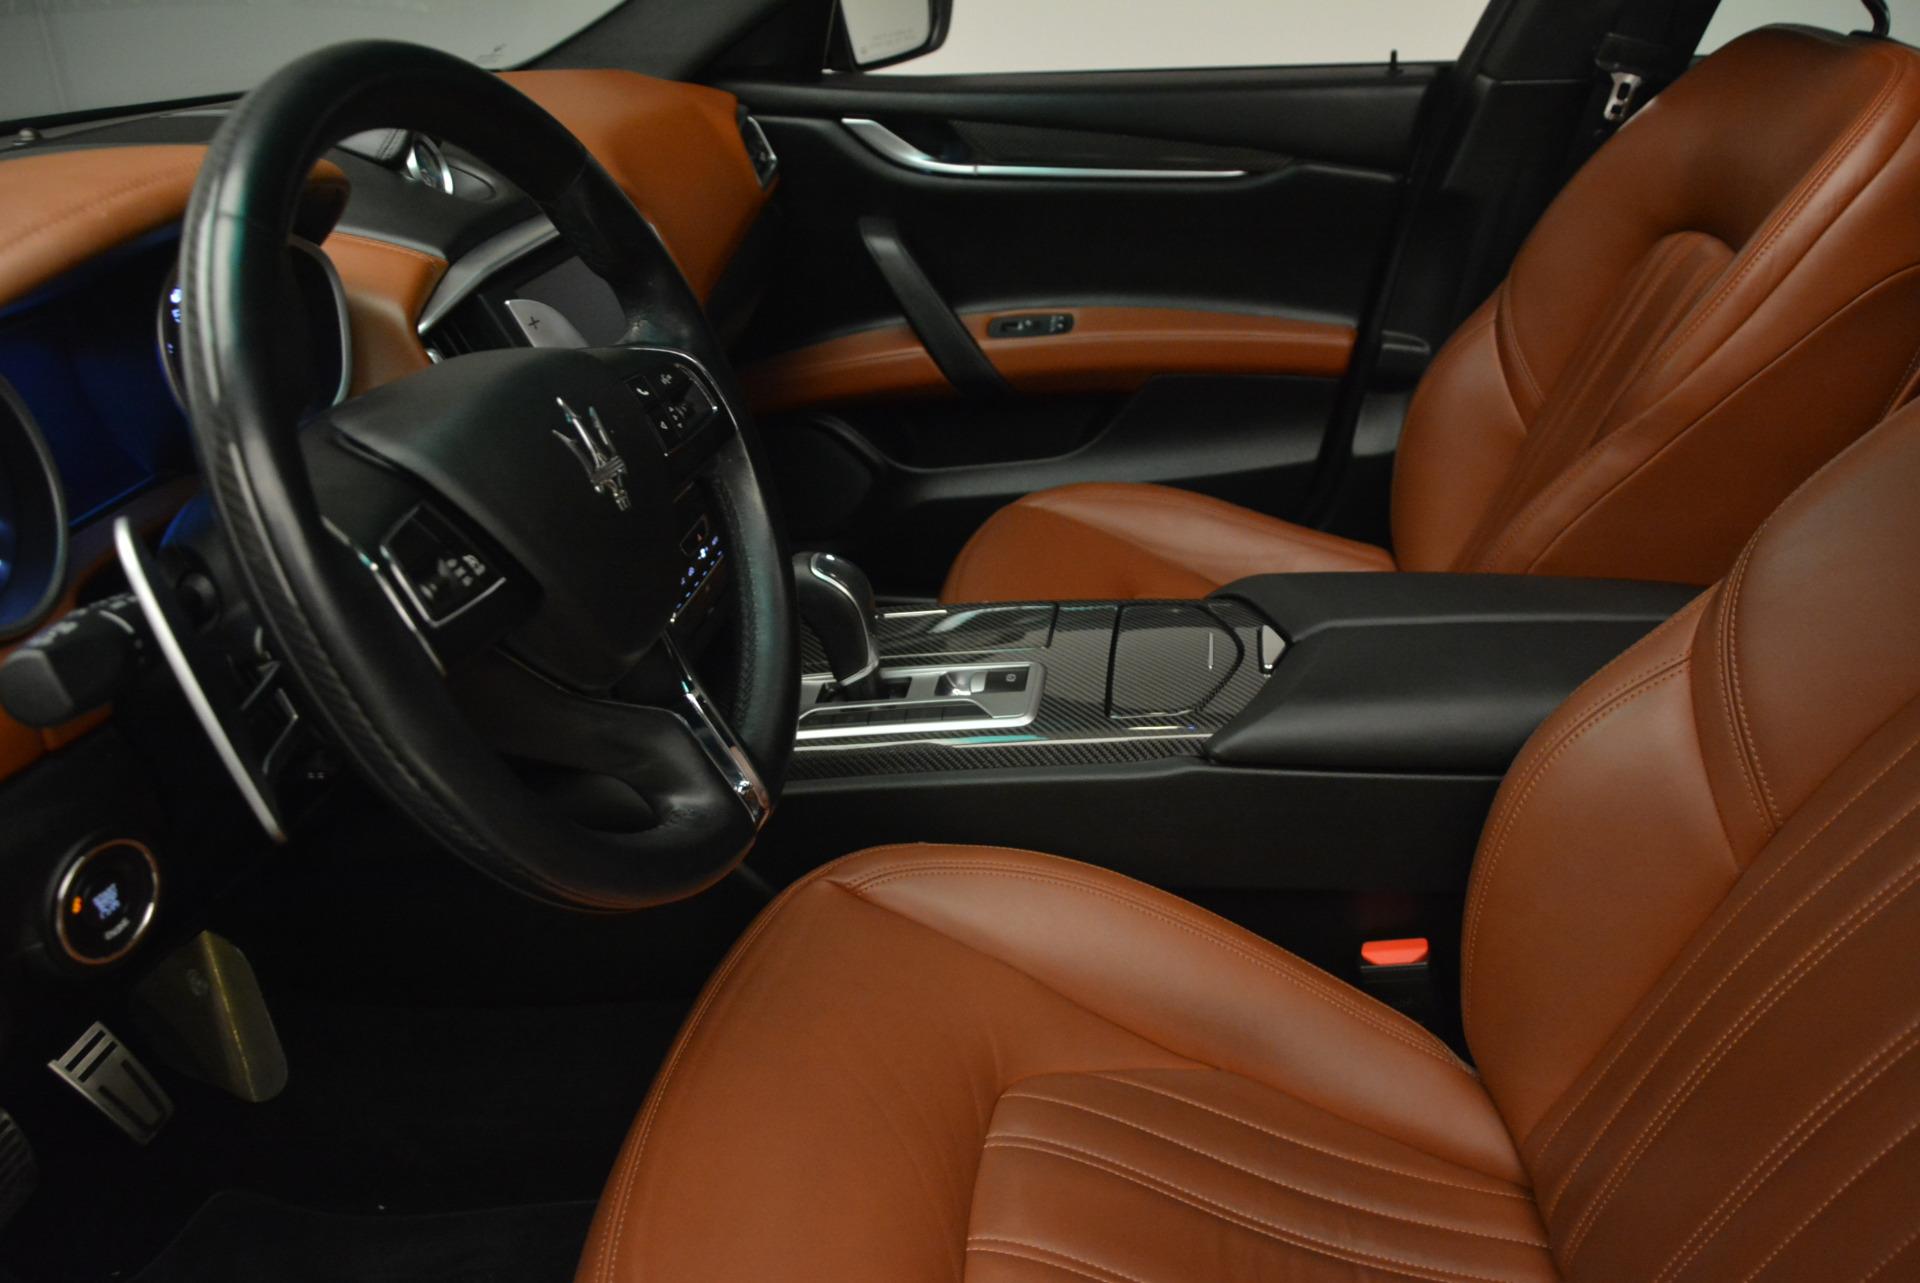 Used 2014 Maserati Ghibli S Q4 For Sale In Greenwich, CT 805_p14